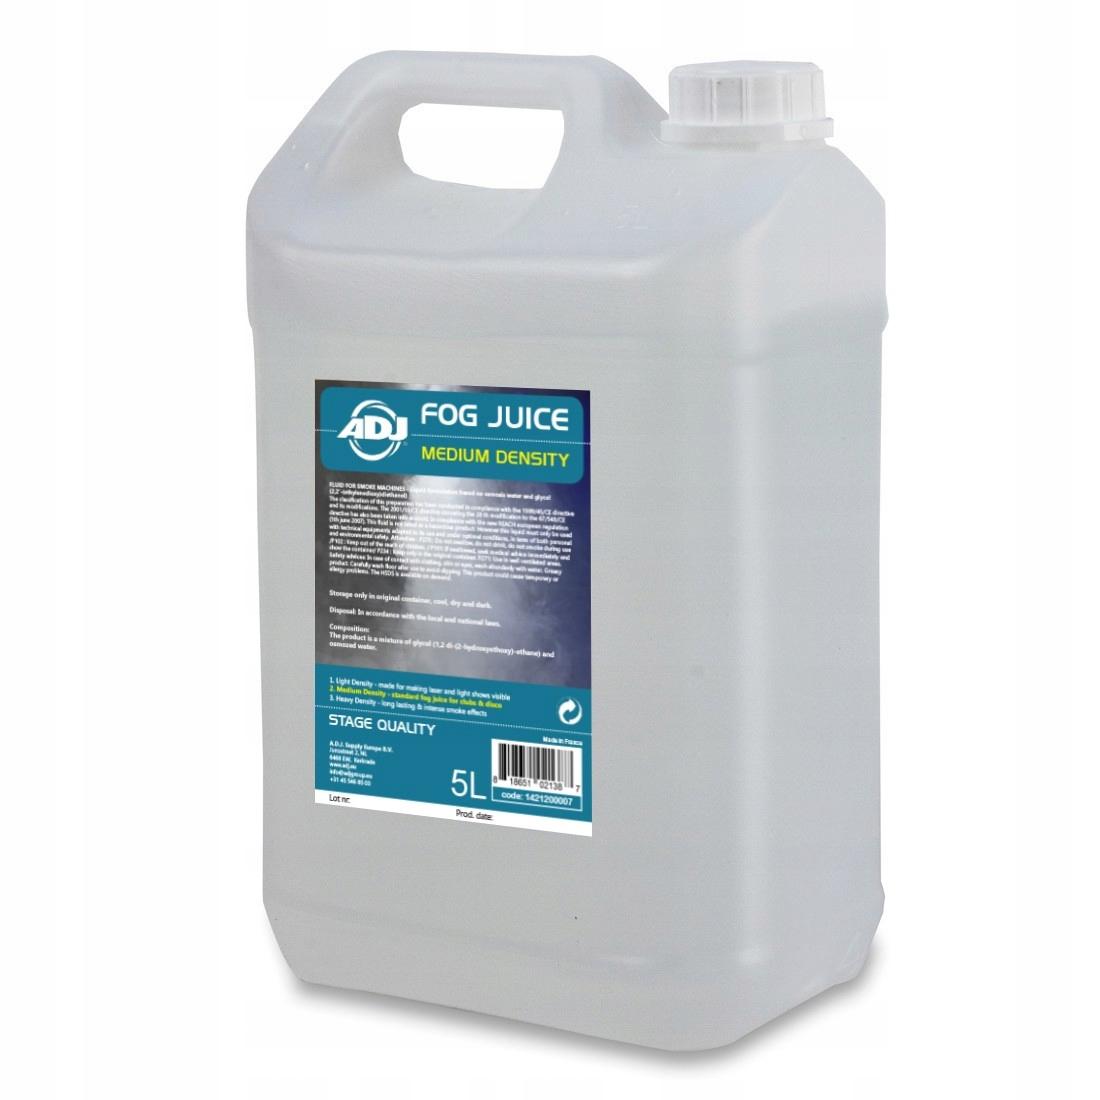 Adj Fog Juice 2 Stredná 5L kvapalina pre generátor dymu